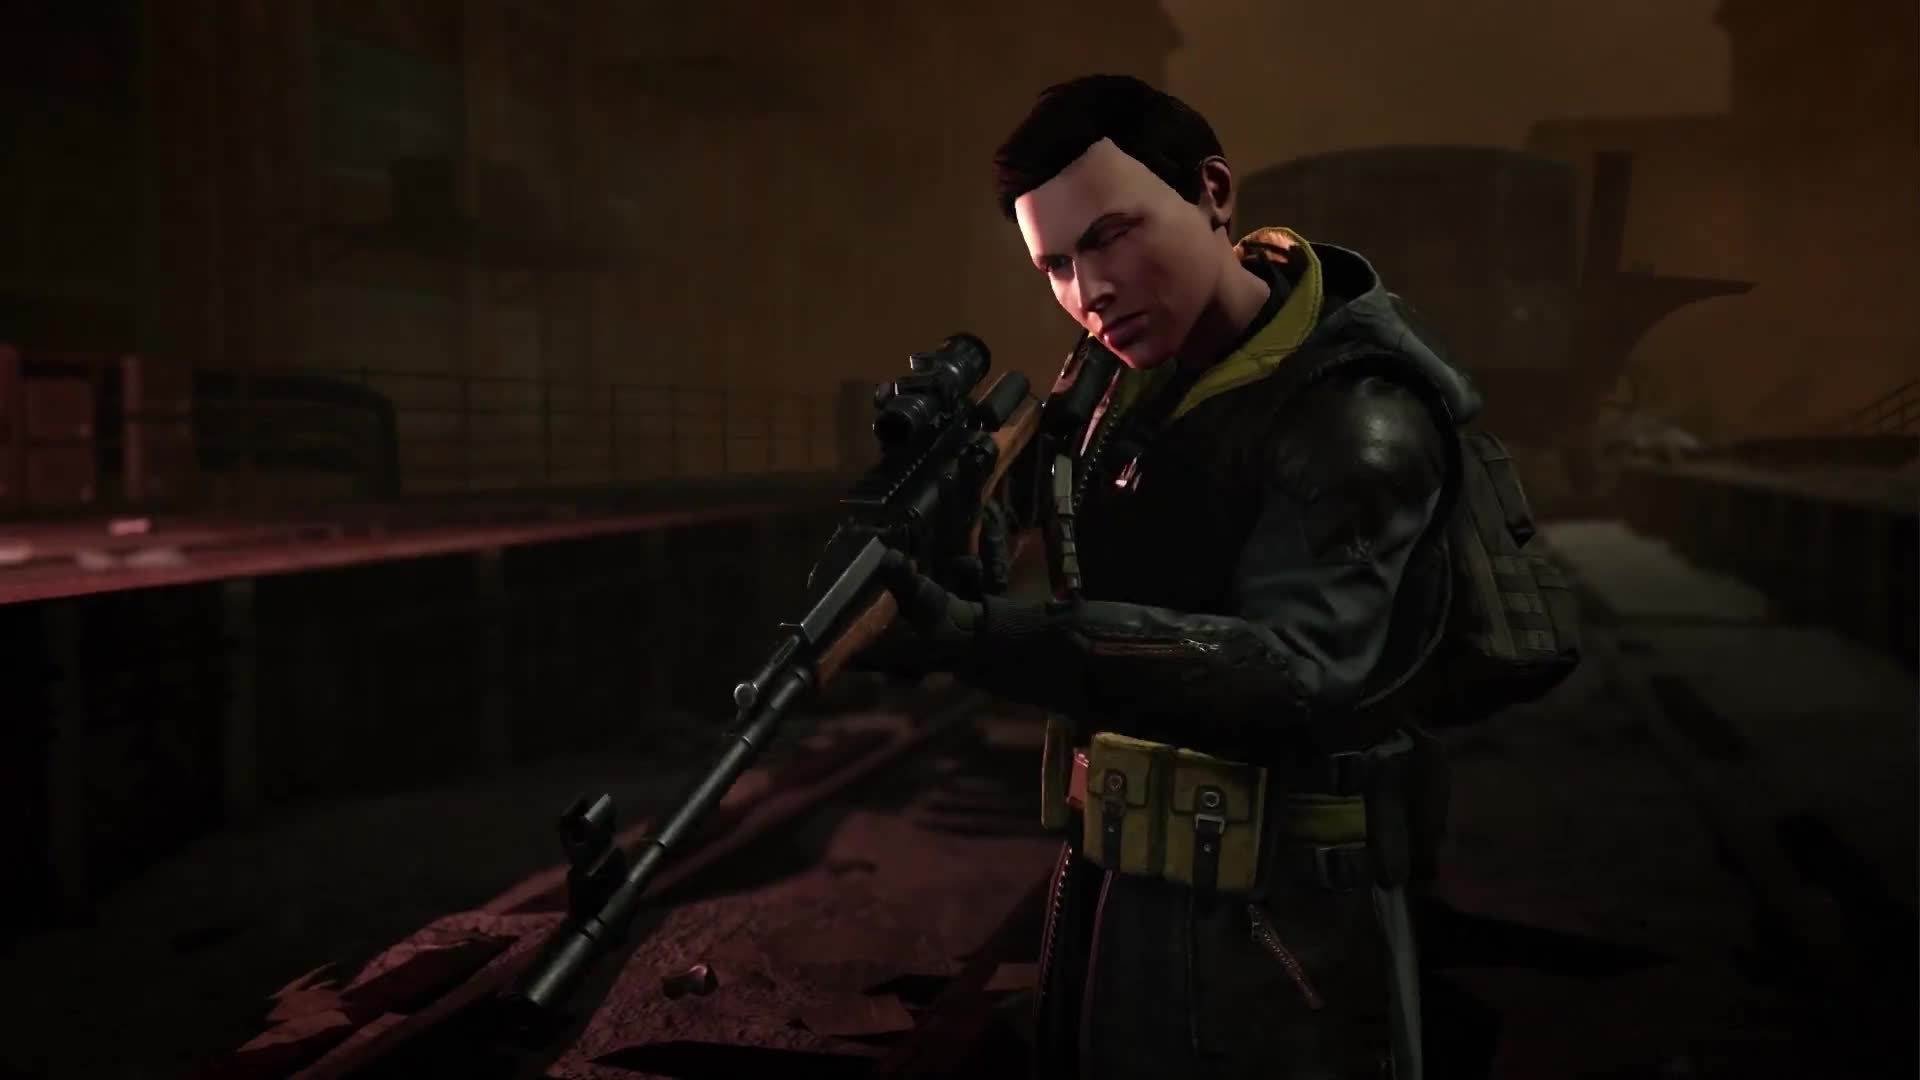 game, war of the chosen, xcom, XCOM Bullet-Timing GIFs